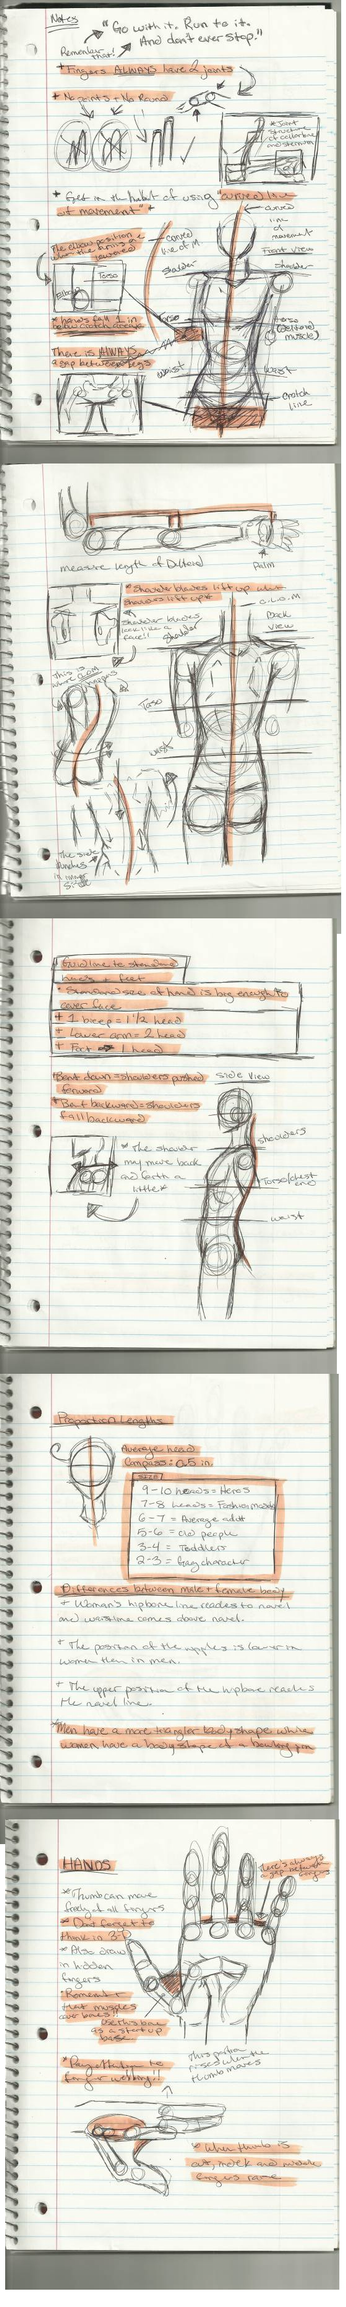 My Anatomy Notes by edwardsuoh13